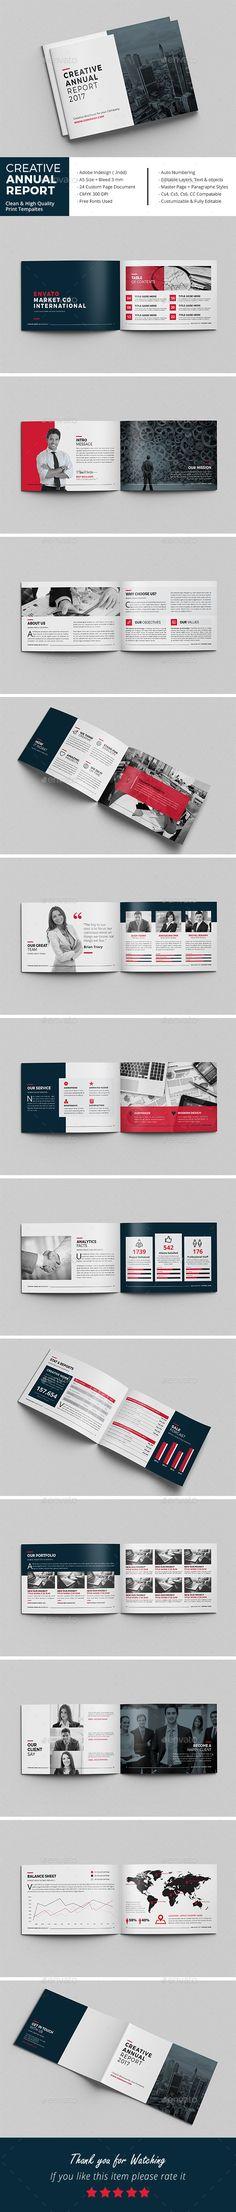 Corporate Creative Annual Report Brochure Template - #Corporate #Creative #Annual #Report #Brochure #Template #Design. Download here: https://graphicriver.net/item/creative-annual-report-brochure/19530251?ref=yinkira